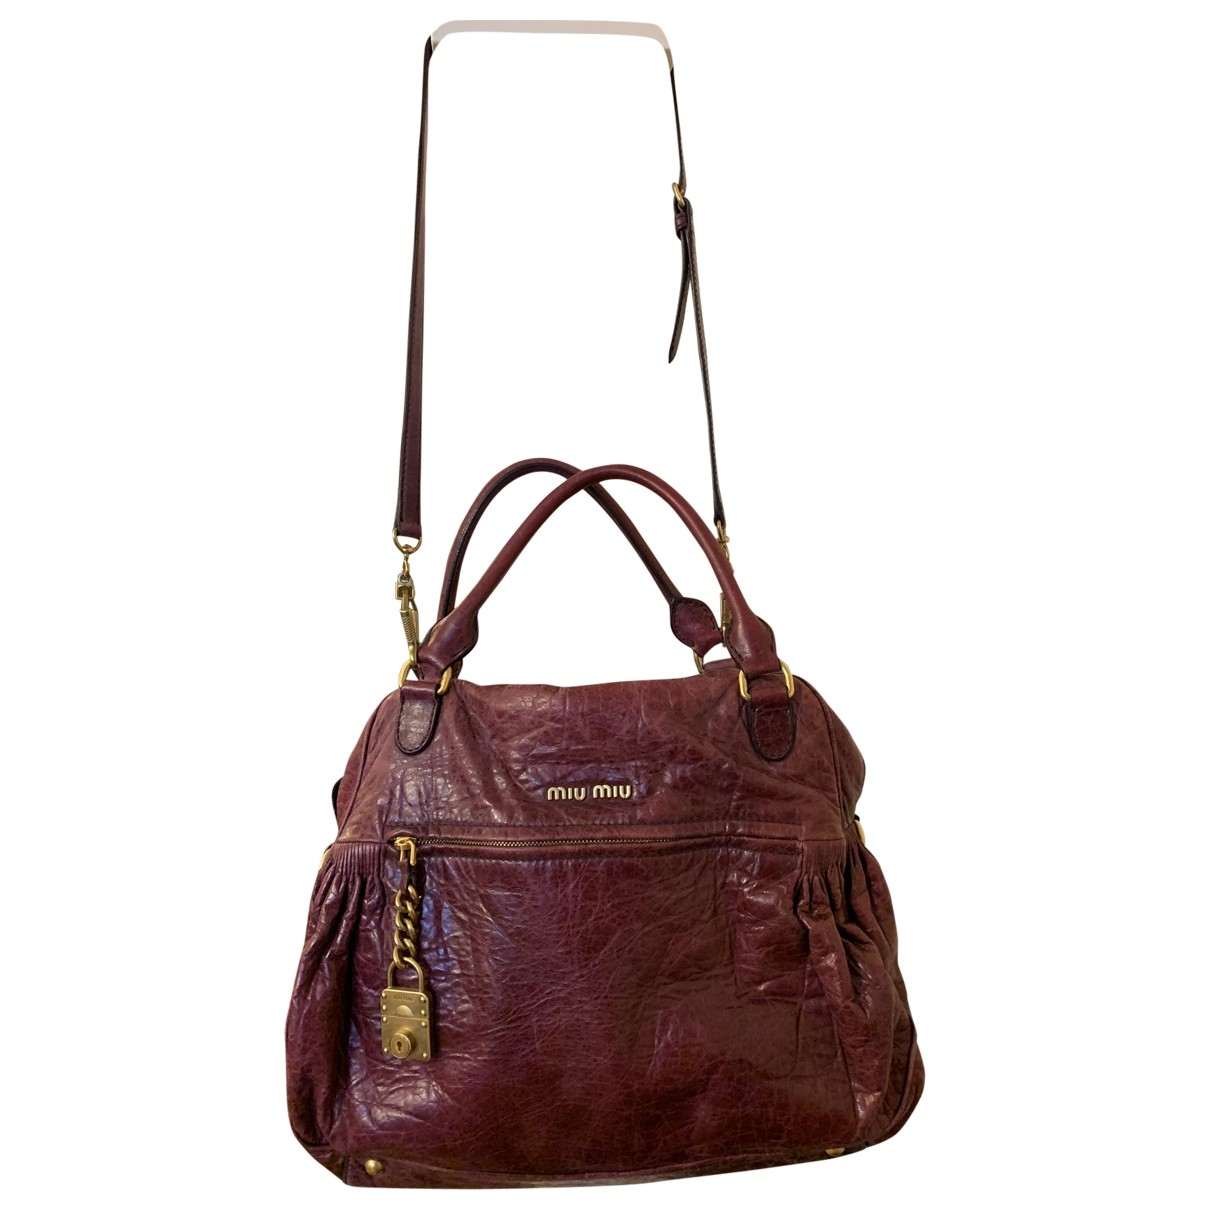 Miu Miu \N Purple Leather handbag for Women \N